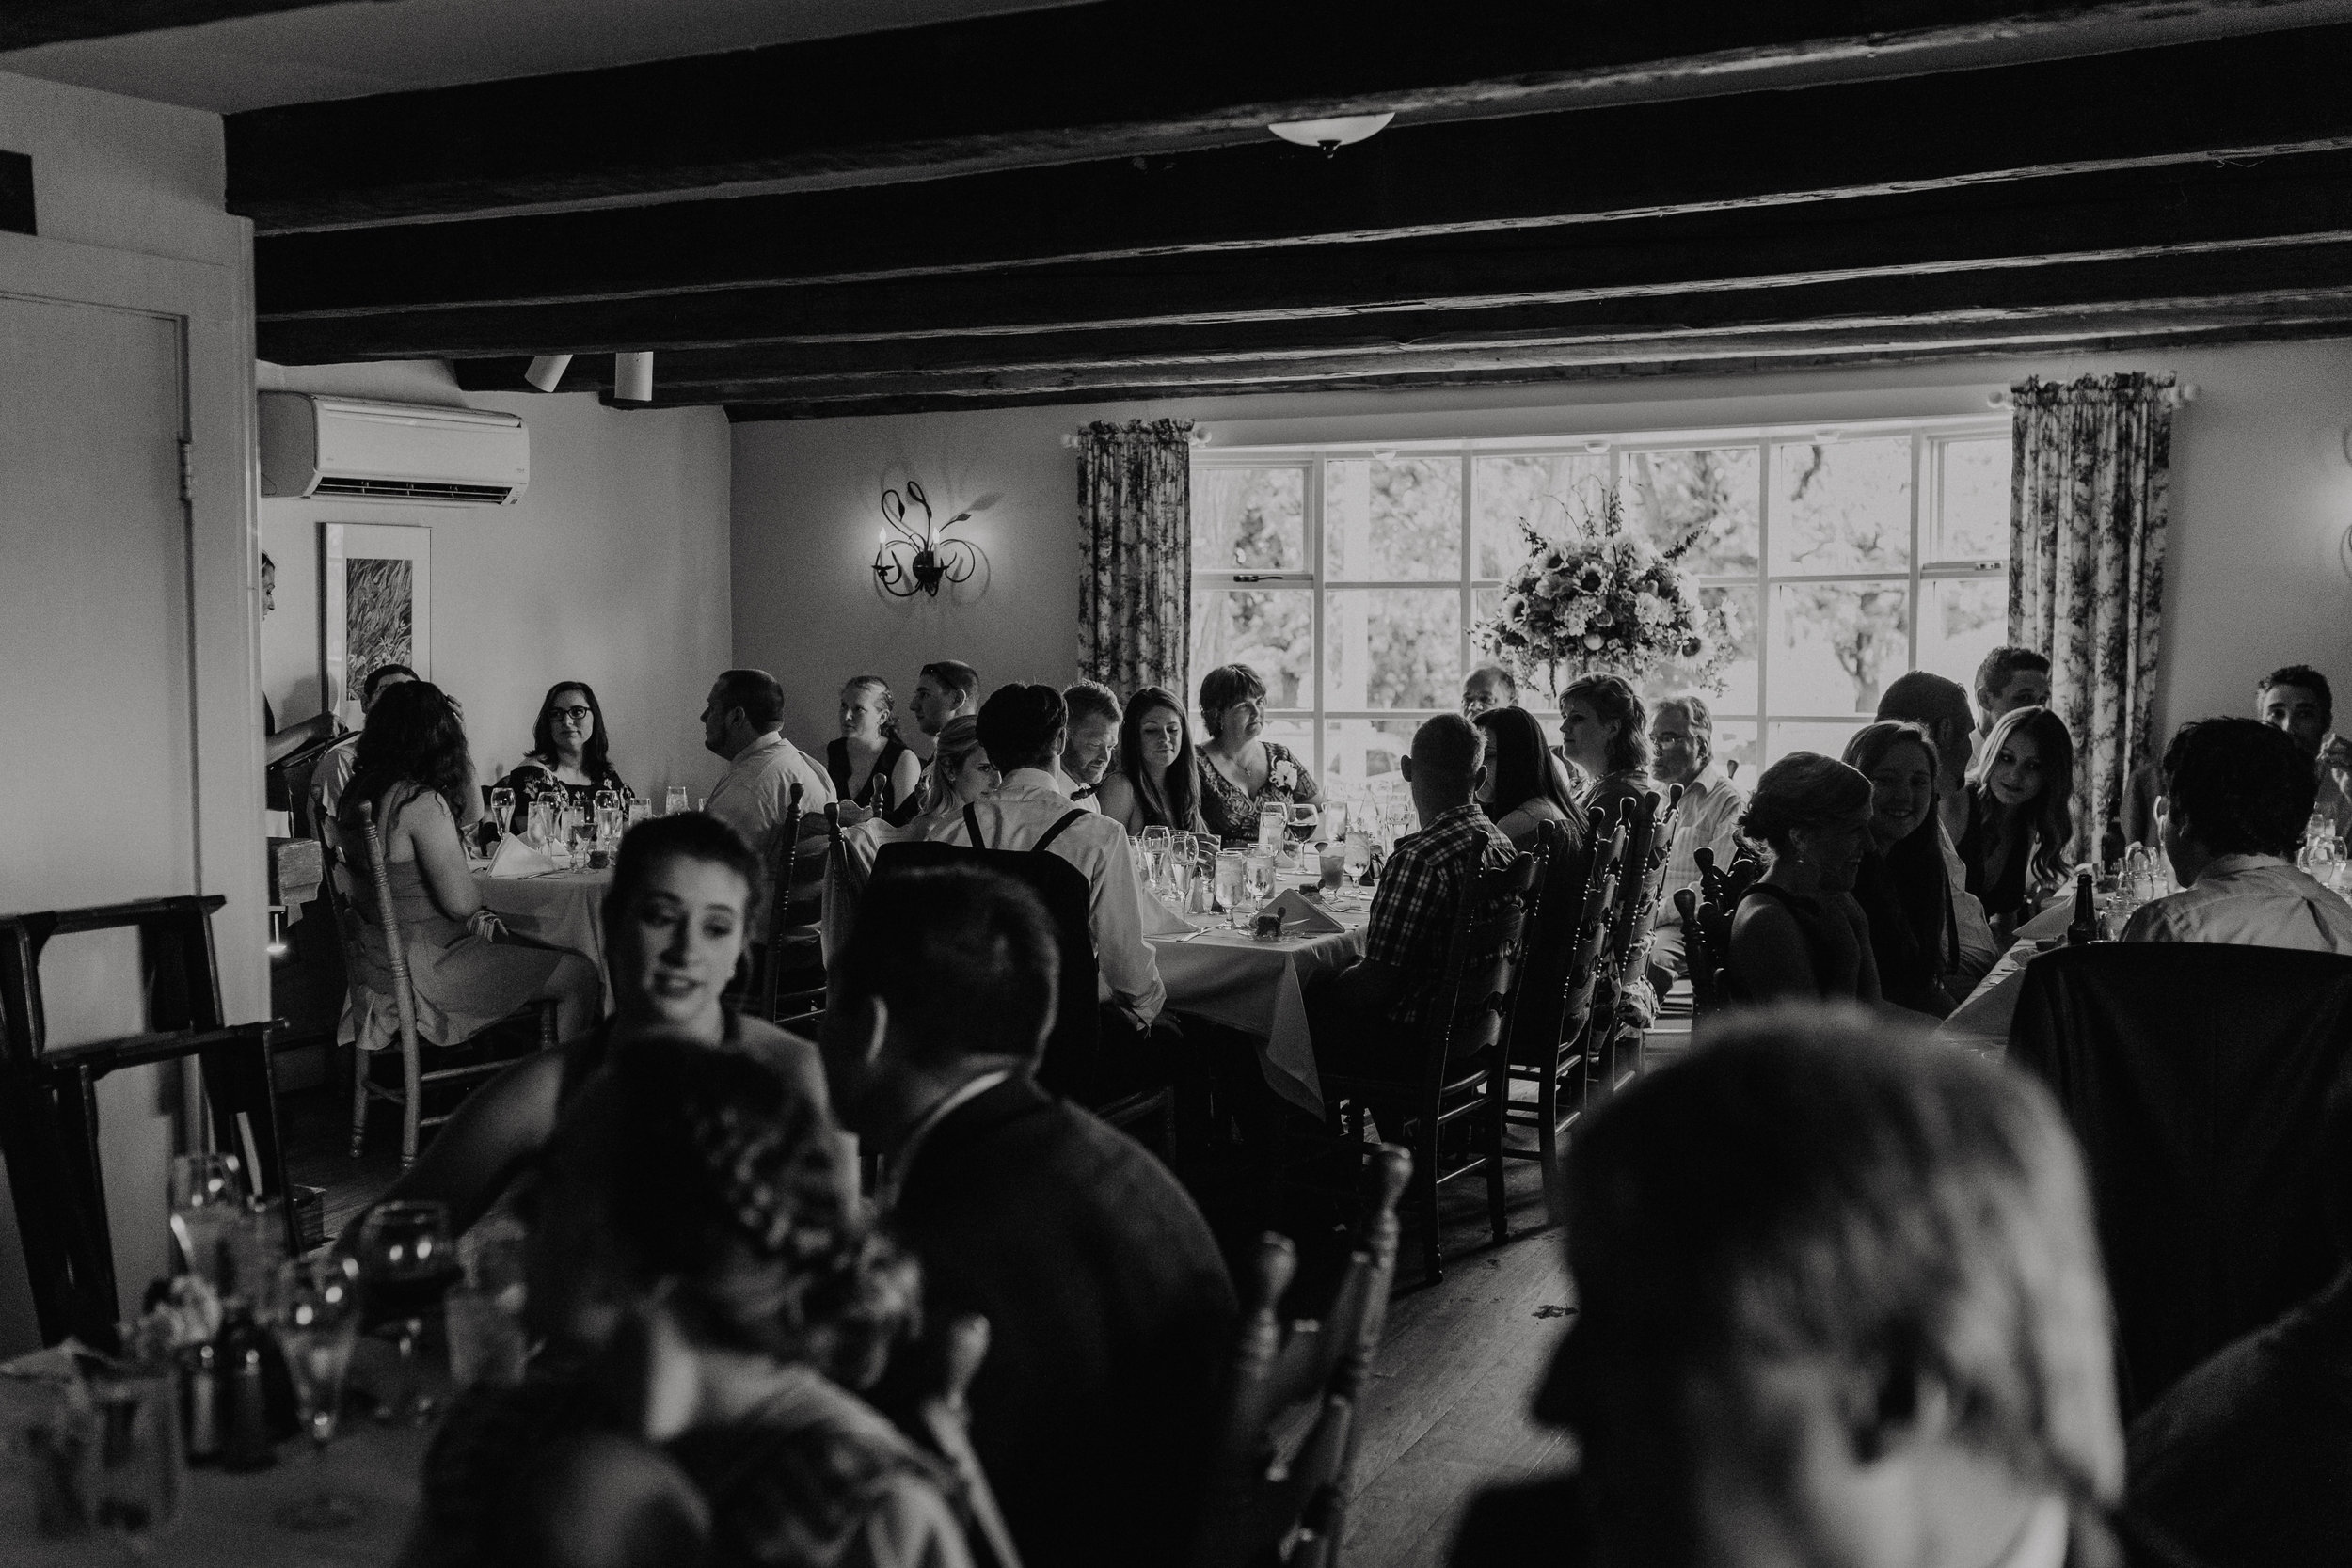 upstate_ny_wedding-52.jpg